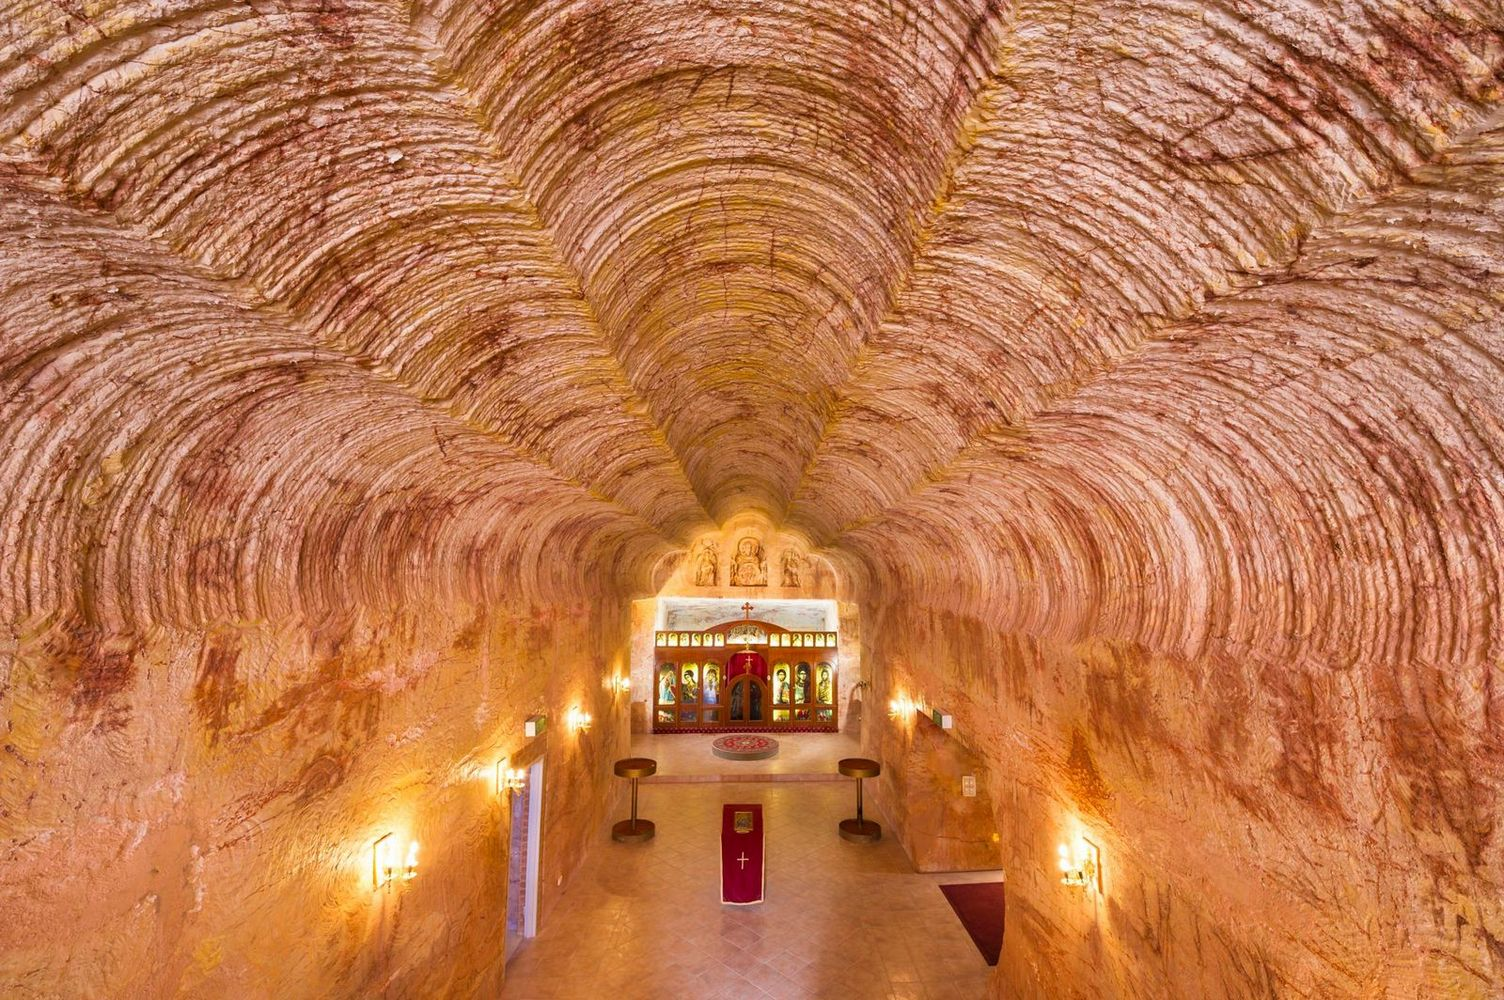 Coober Pedy chapel, Australia - 2023 solar eclipse tour